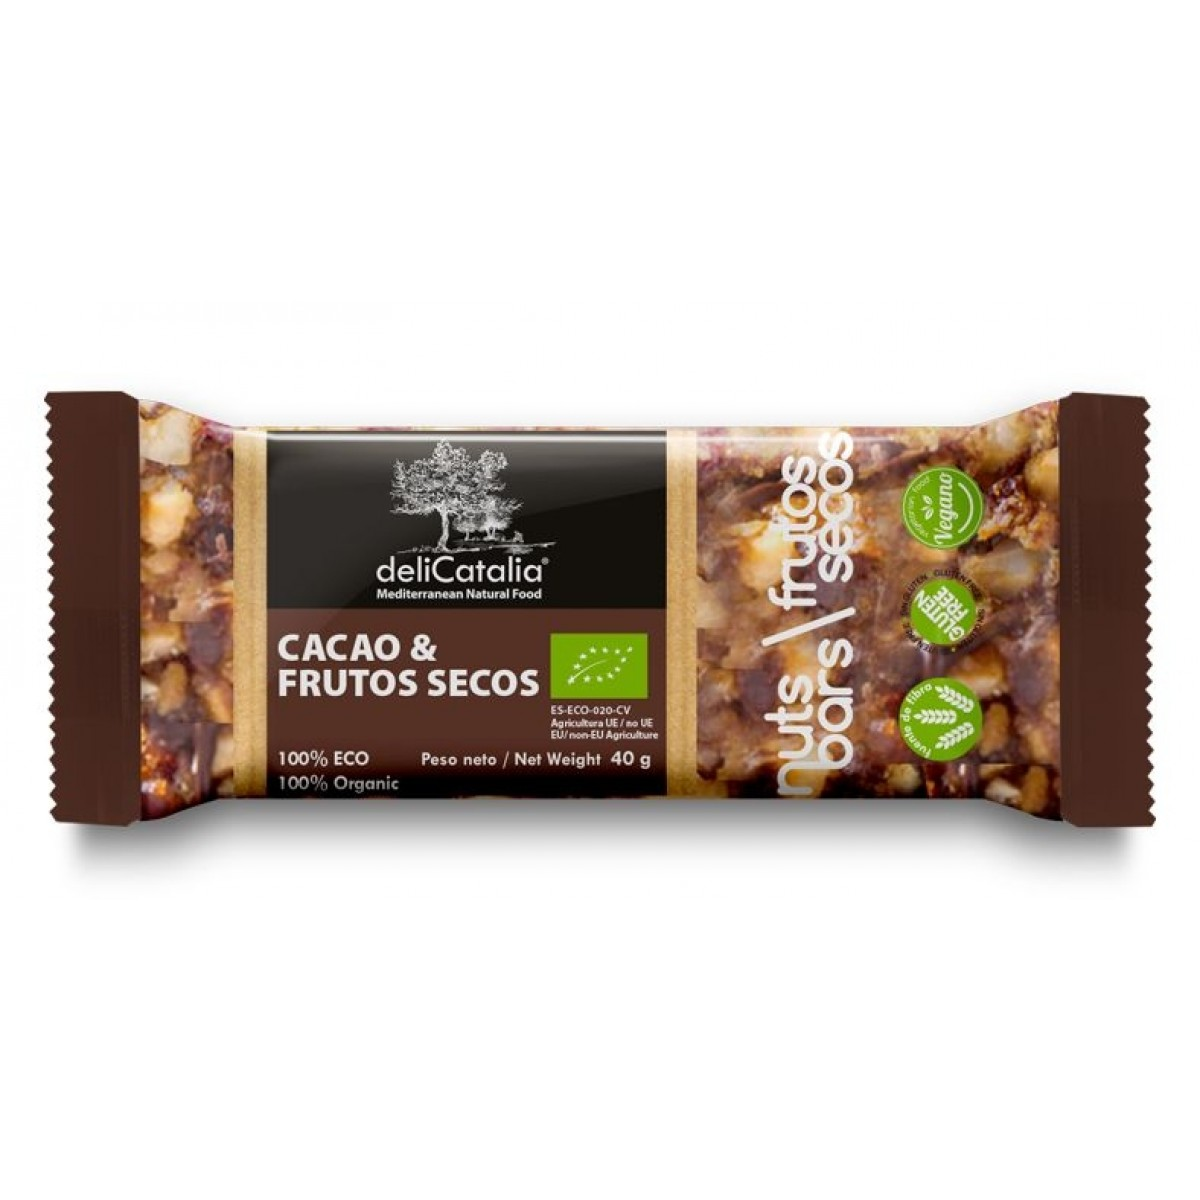 Notenreep met Chocolade